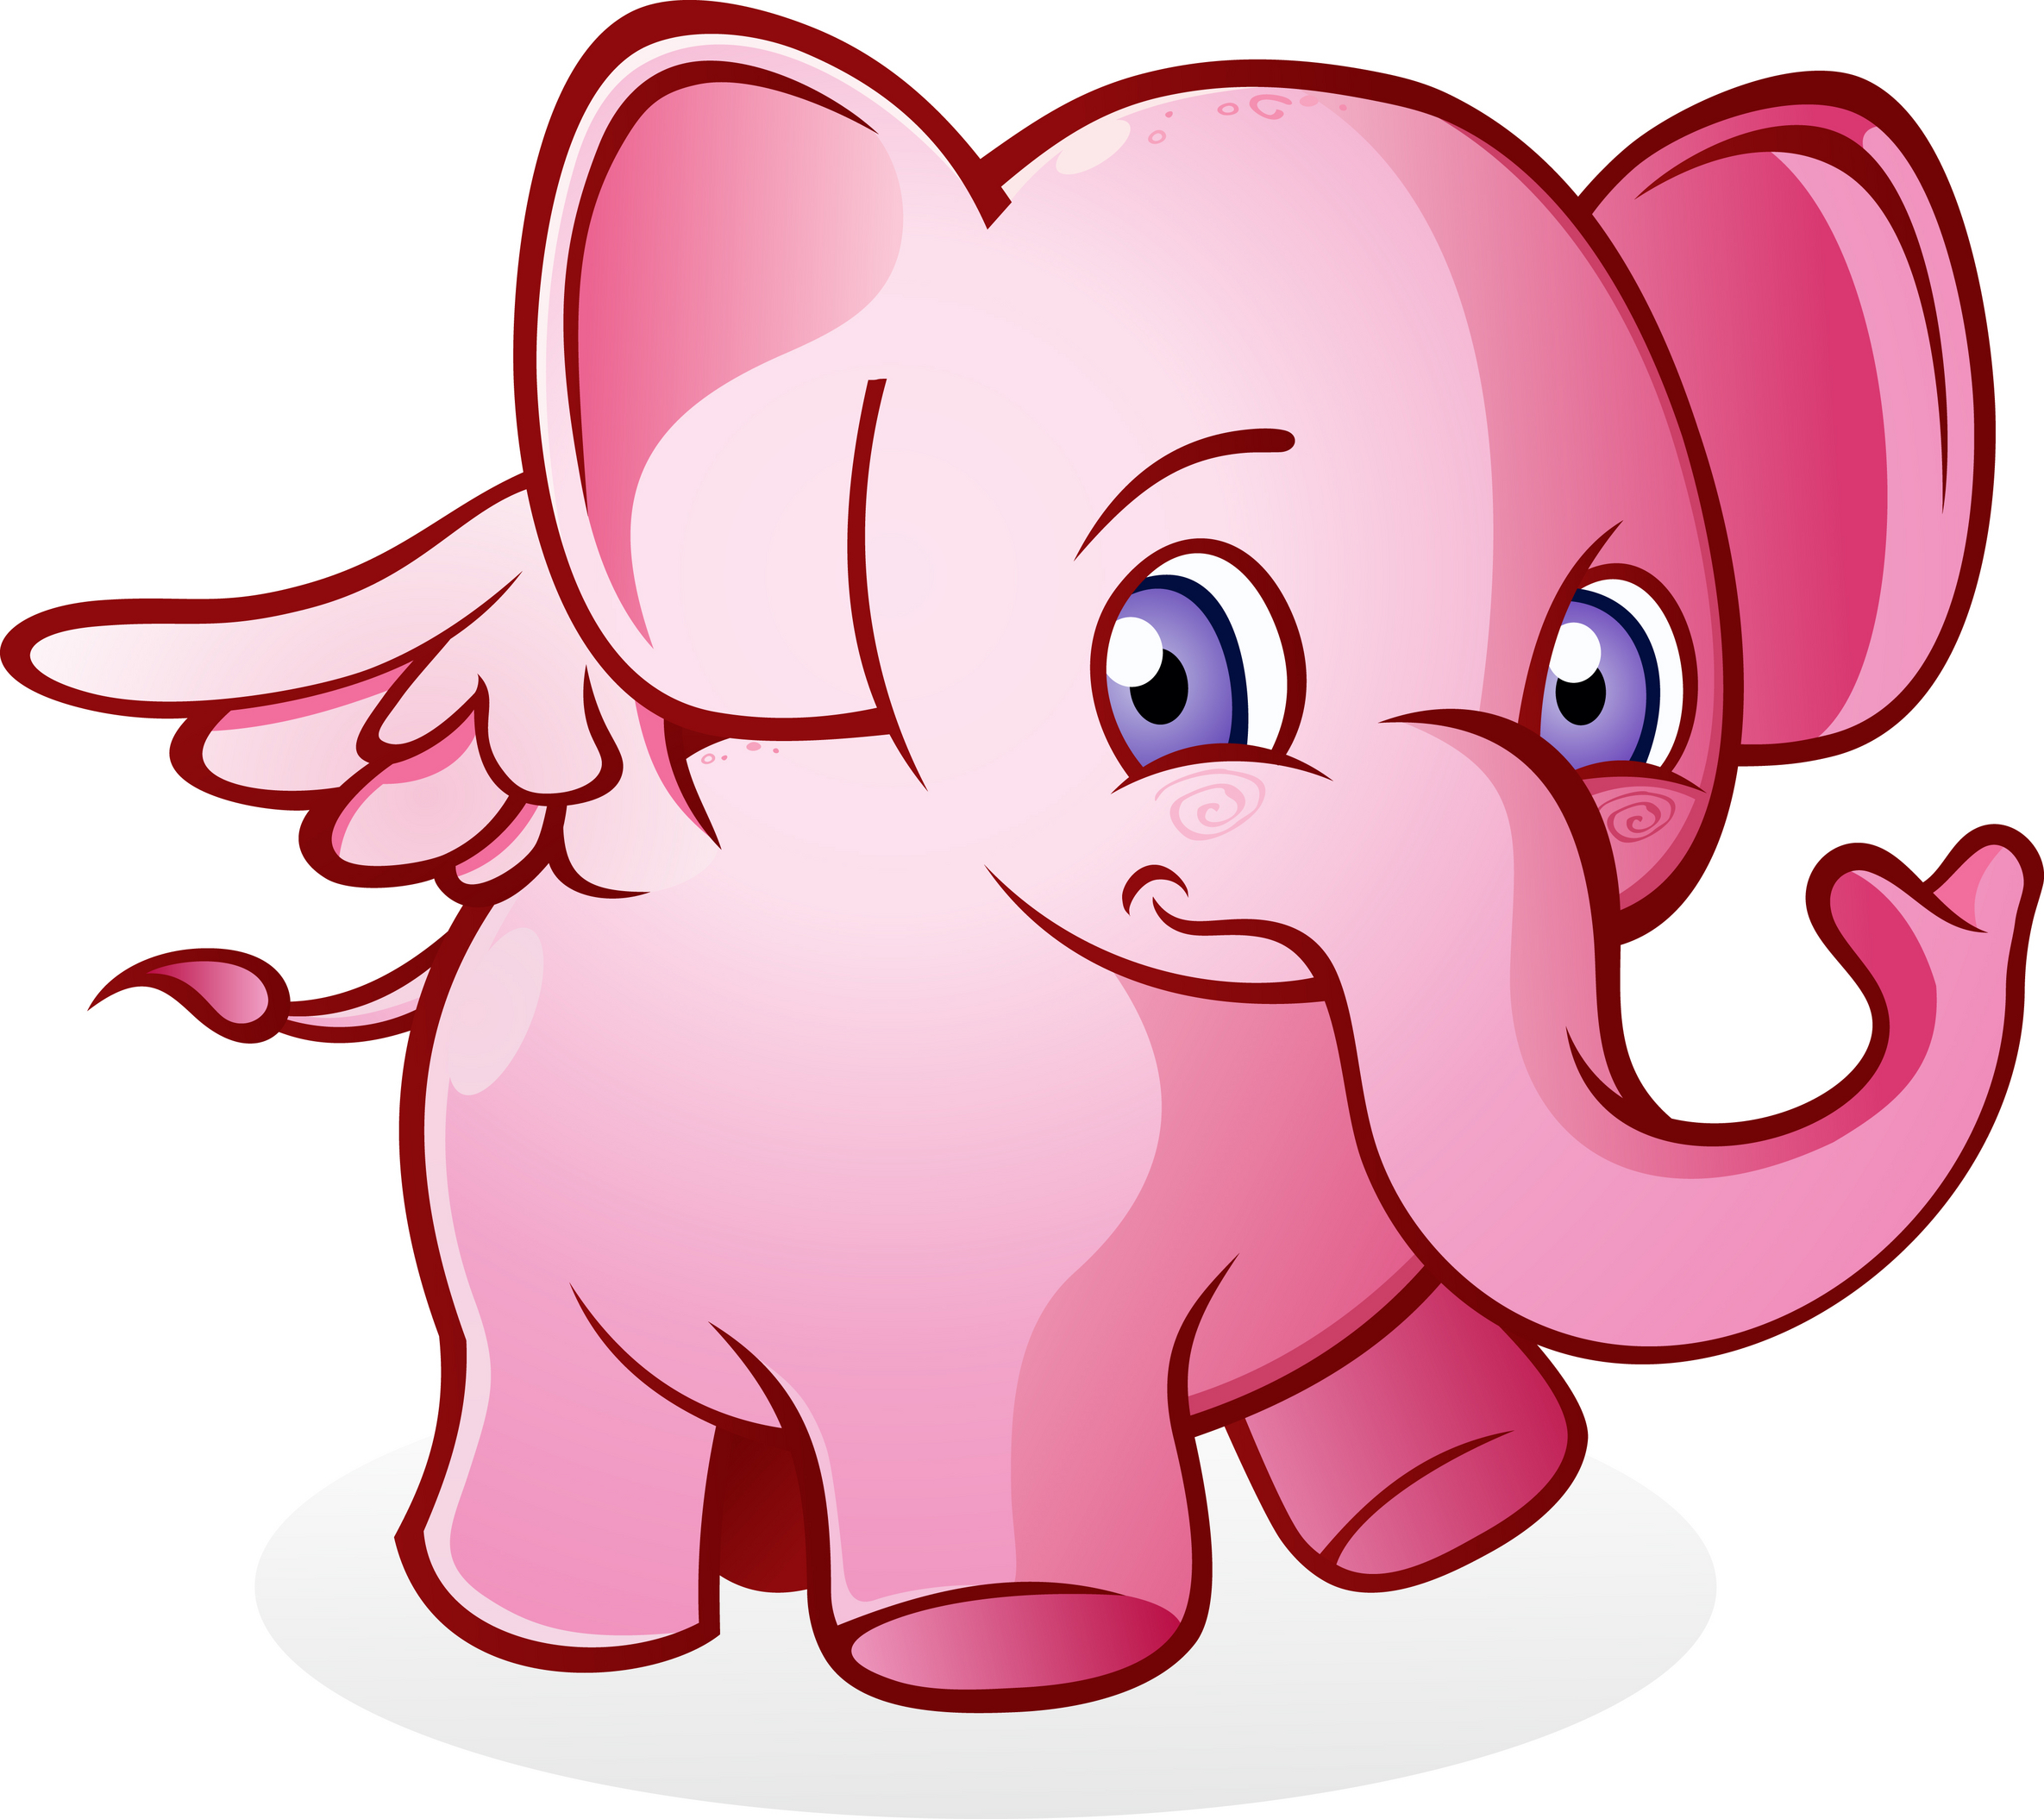 Pink elephants and trauma recovery | Trauma Recovery